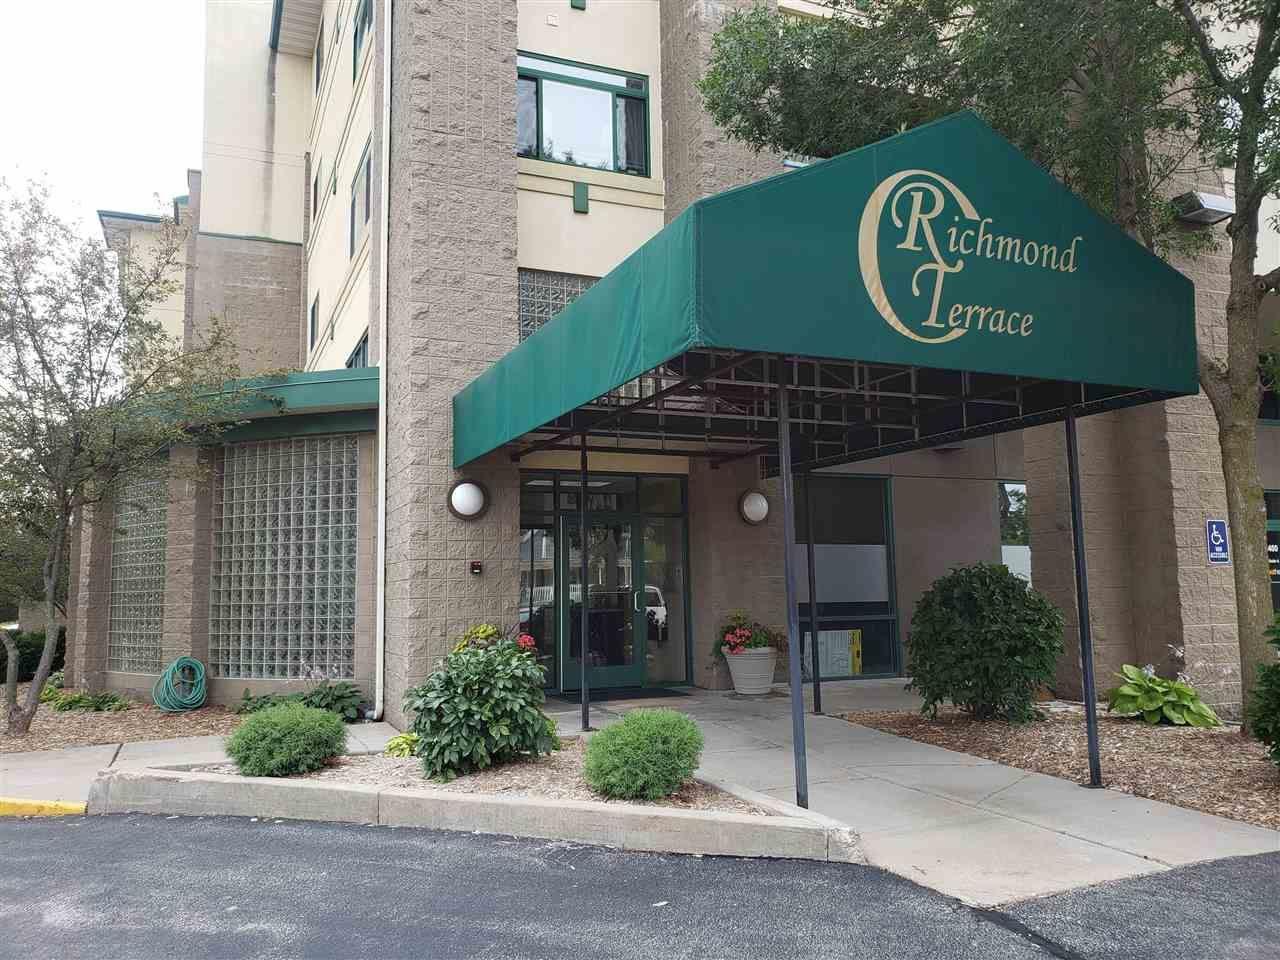 400 N RICHMOND Street #442, Appleton, WI 54911 - MLS#: 50244966